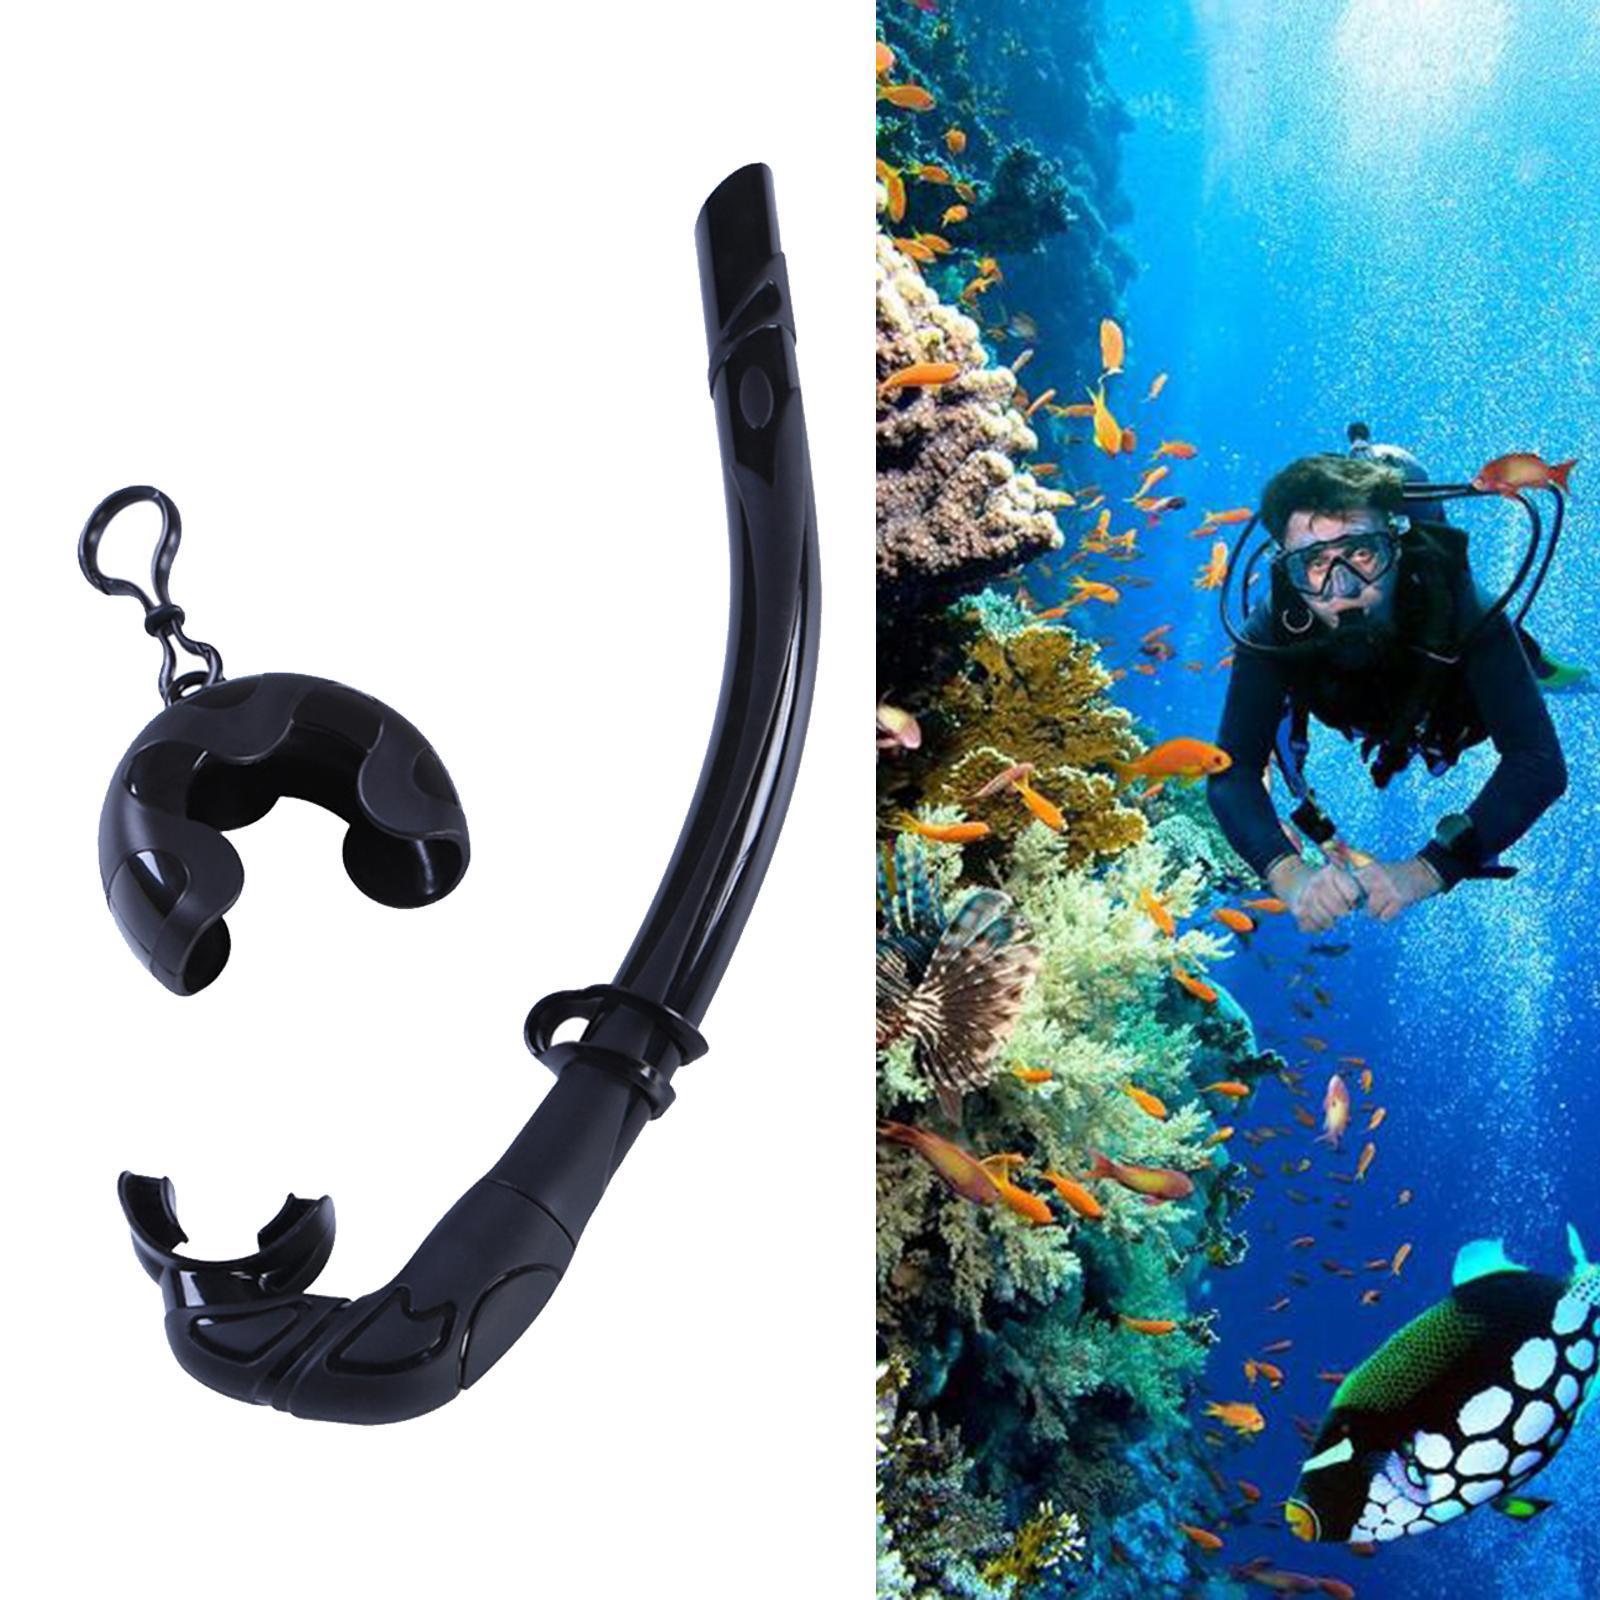 Indexbild 7 - Premium Wet Snorkel Women Men Adults Snorkels Breathing Tube Breath Tube